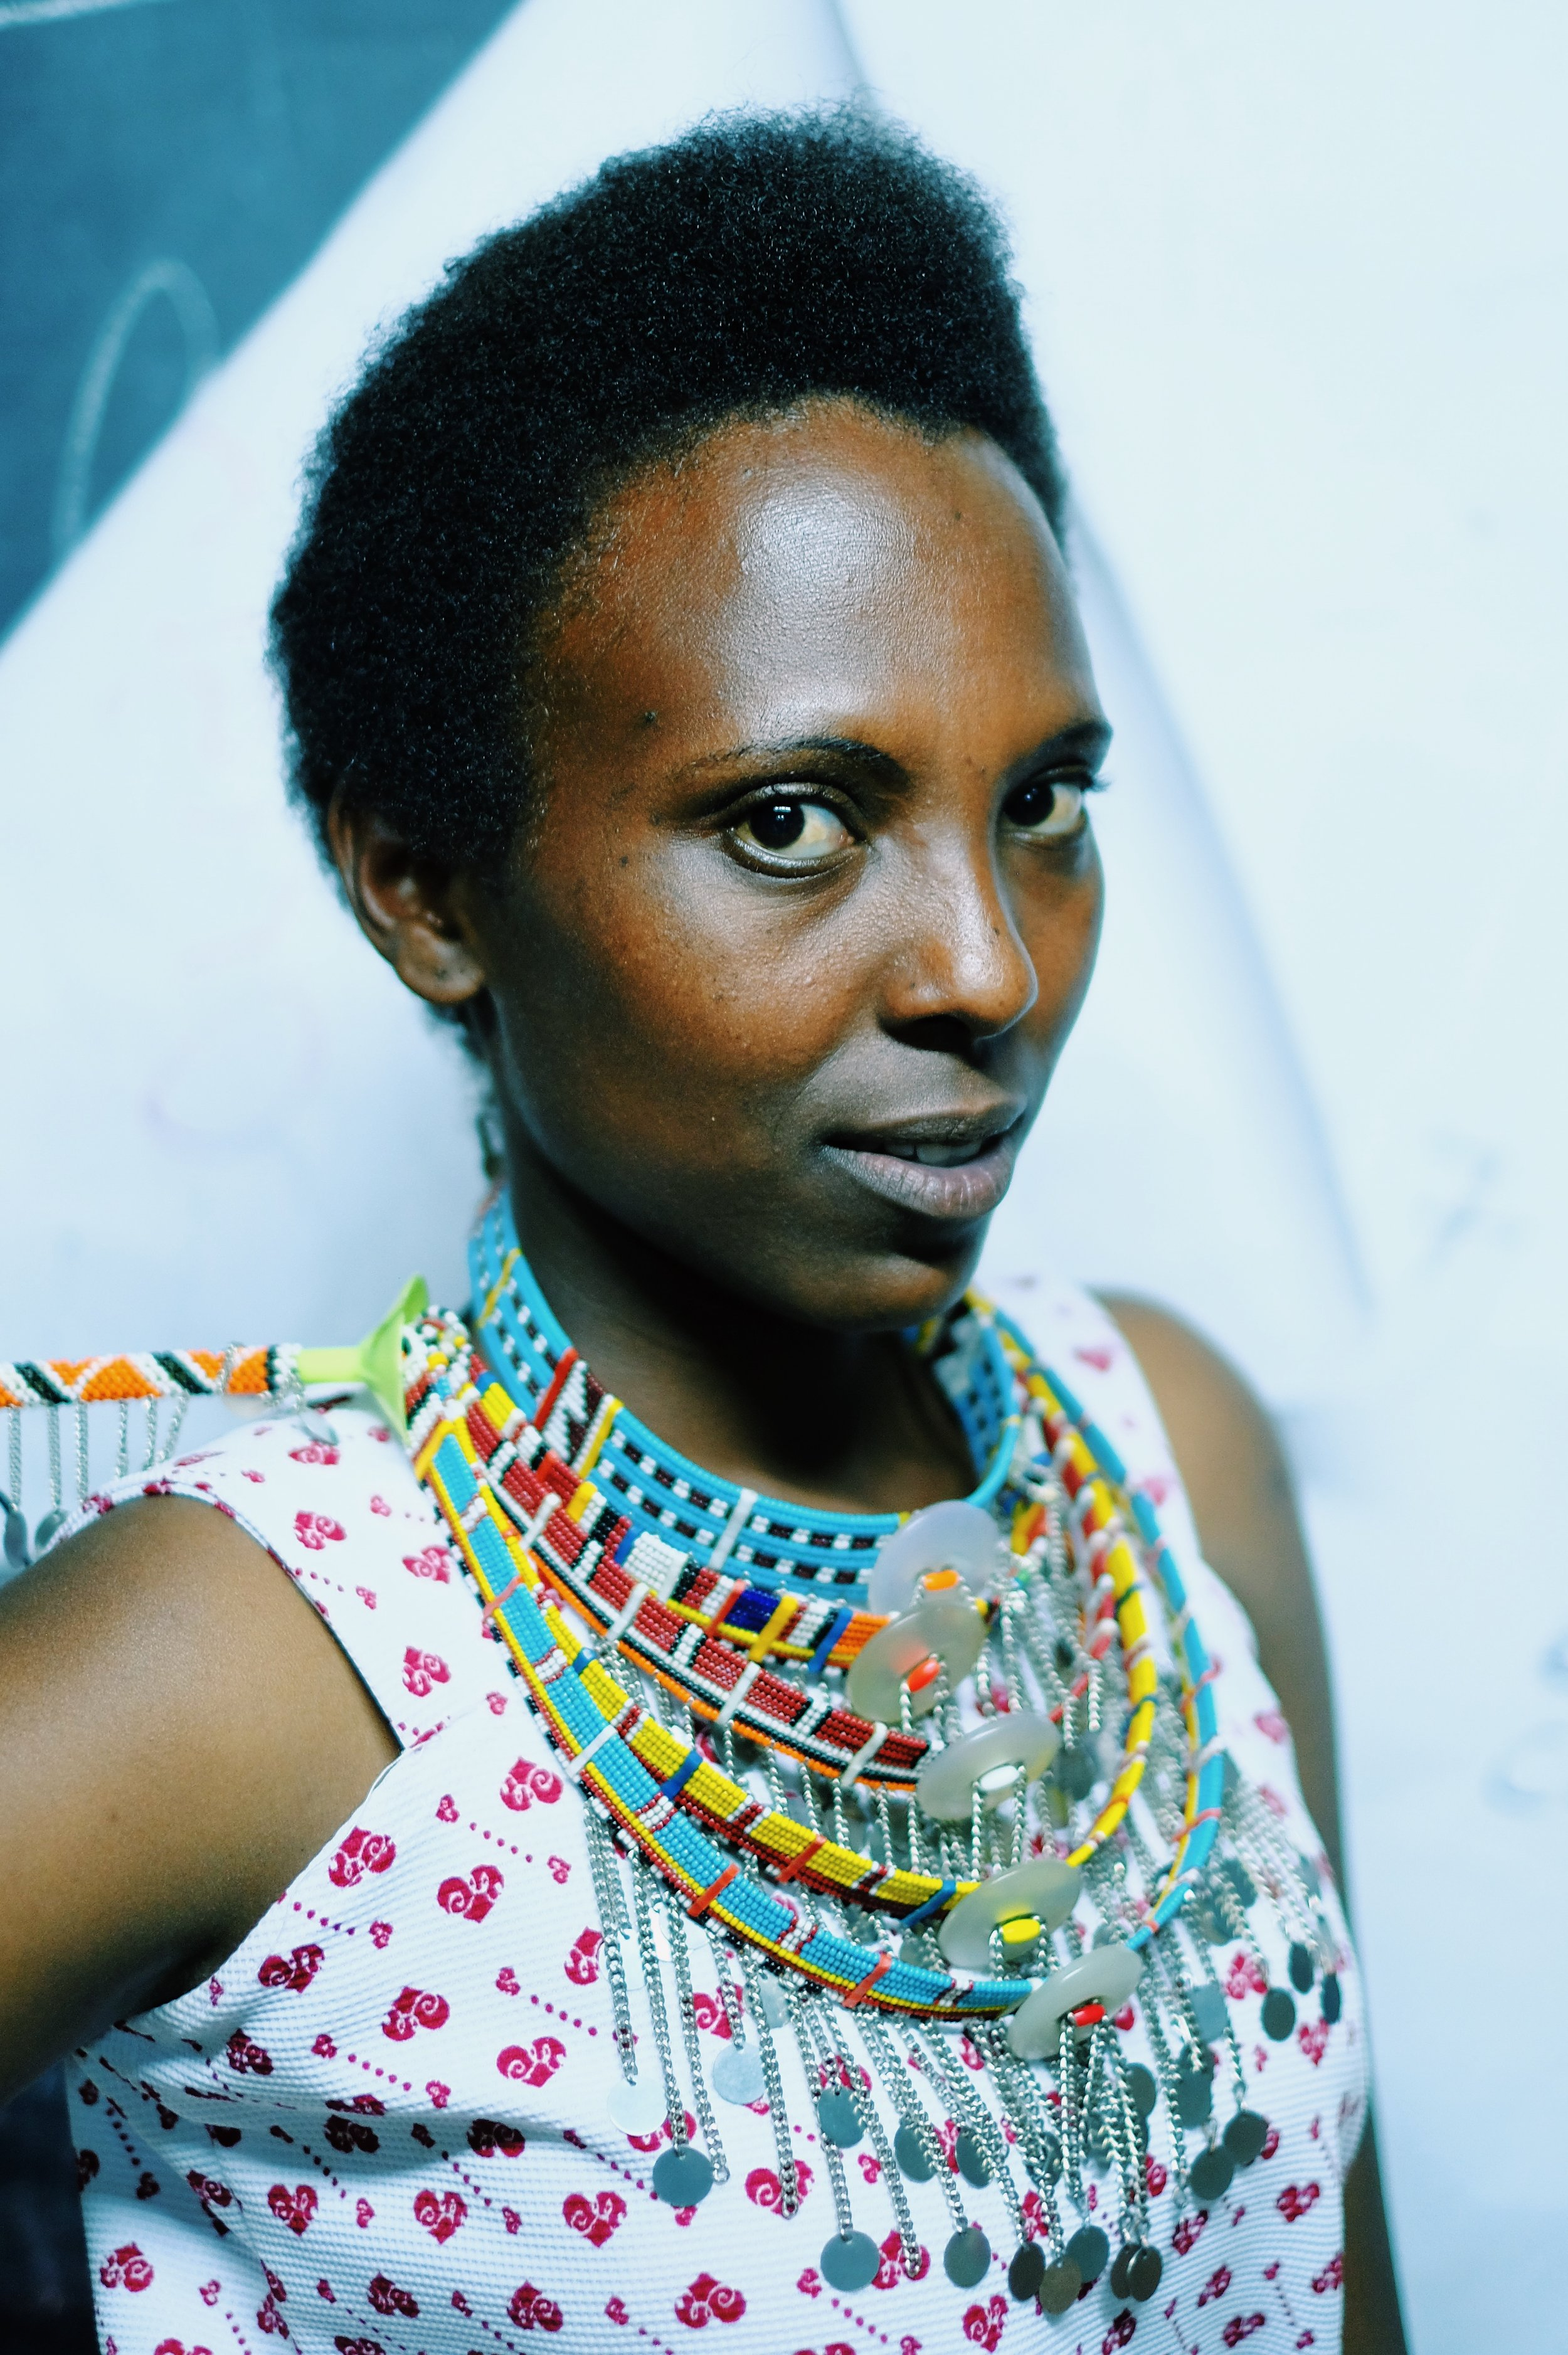 Maasai Olentoko 'End FGM' Beauty Pageant 4 by Joost Bastmeijer.jpeg